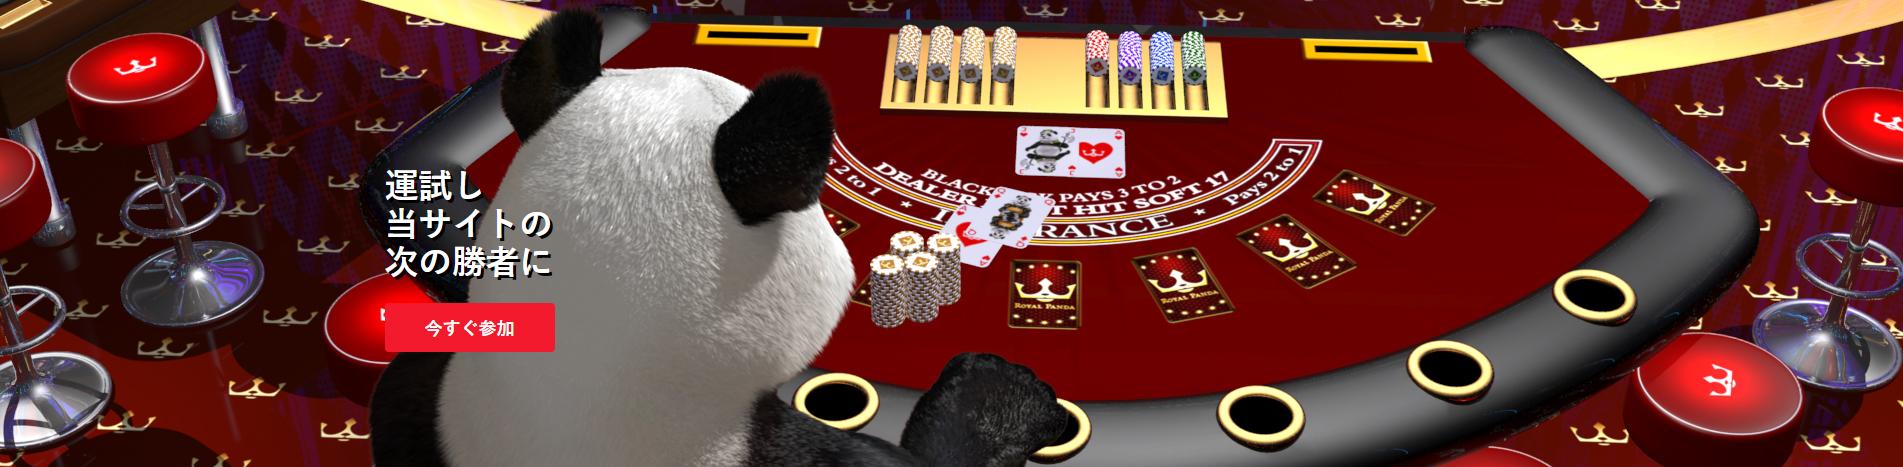 Royal Panda Casino Content Images 04 - Japan CasinoTop